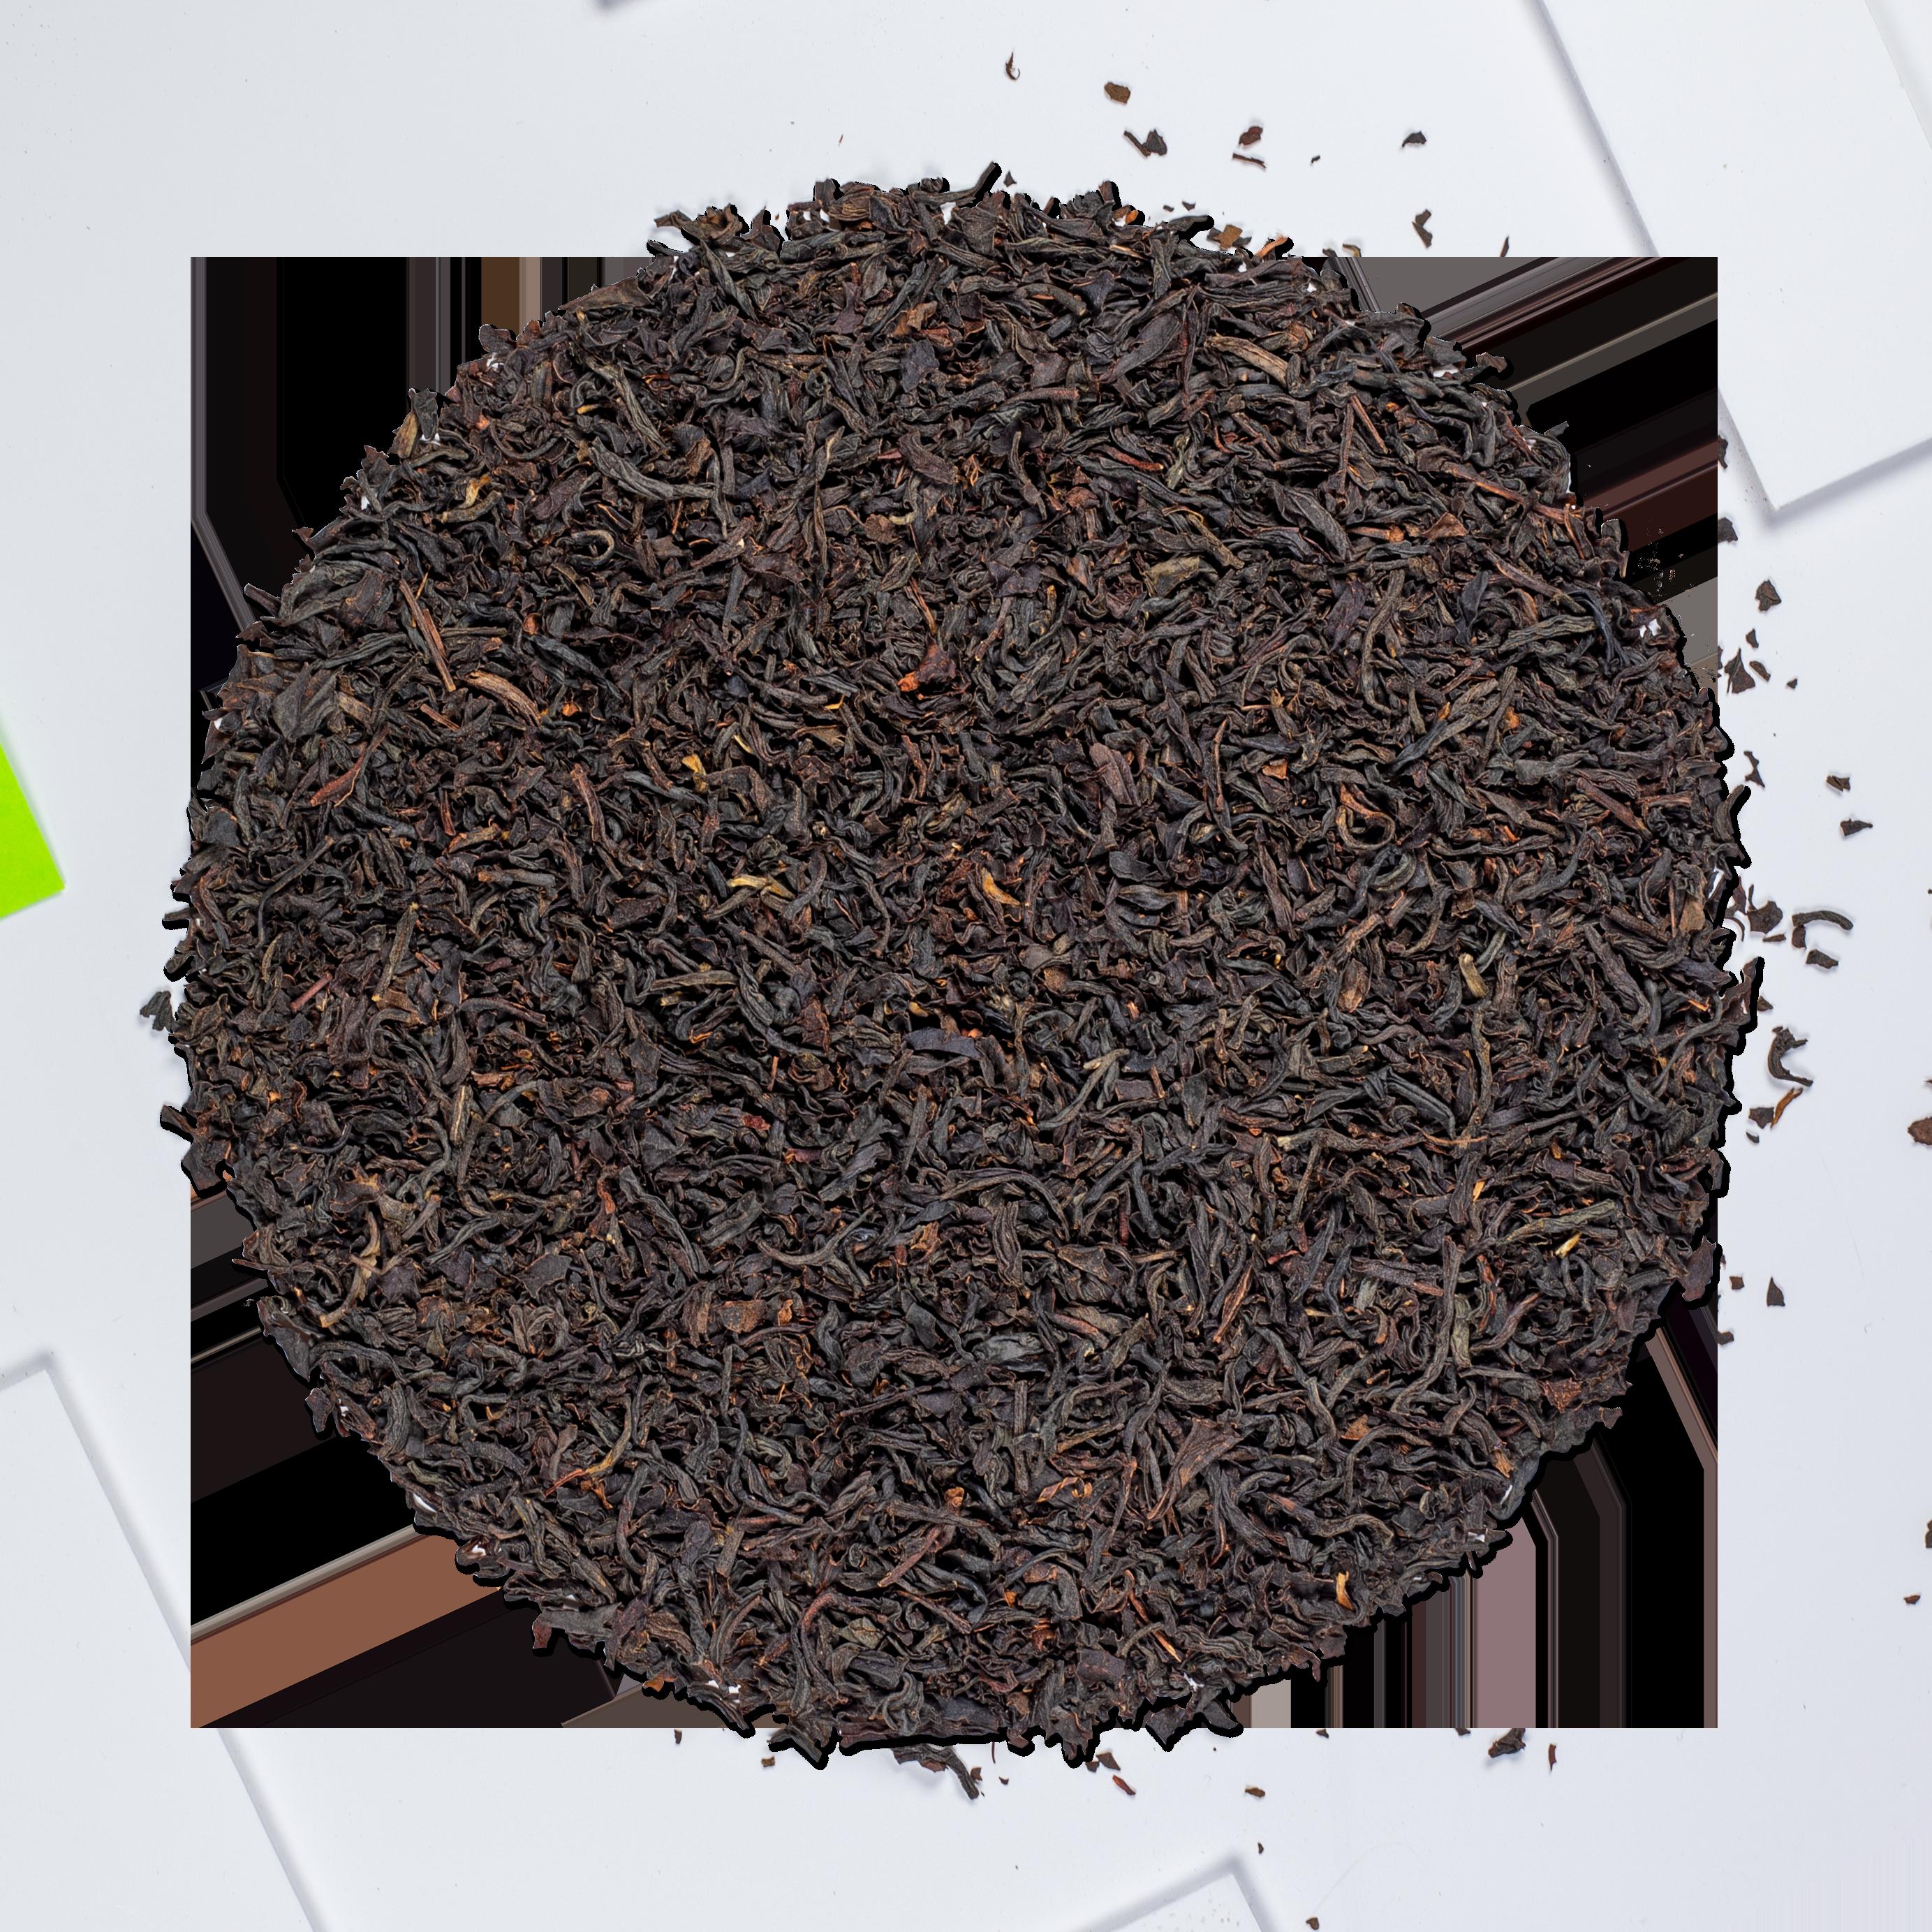 Thé noir - Thé du matin N°24 bio - Vrac - Kusmi Tea